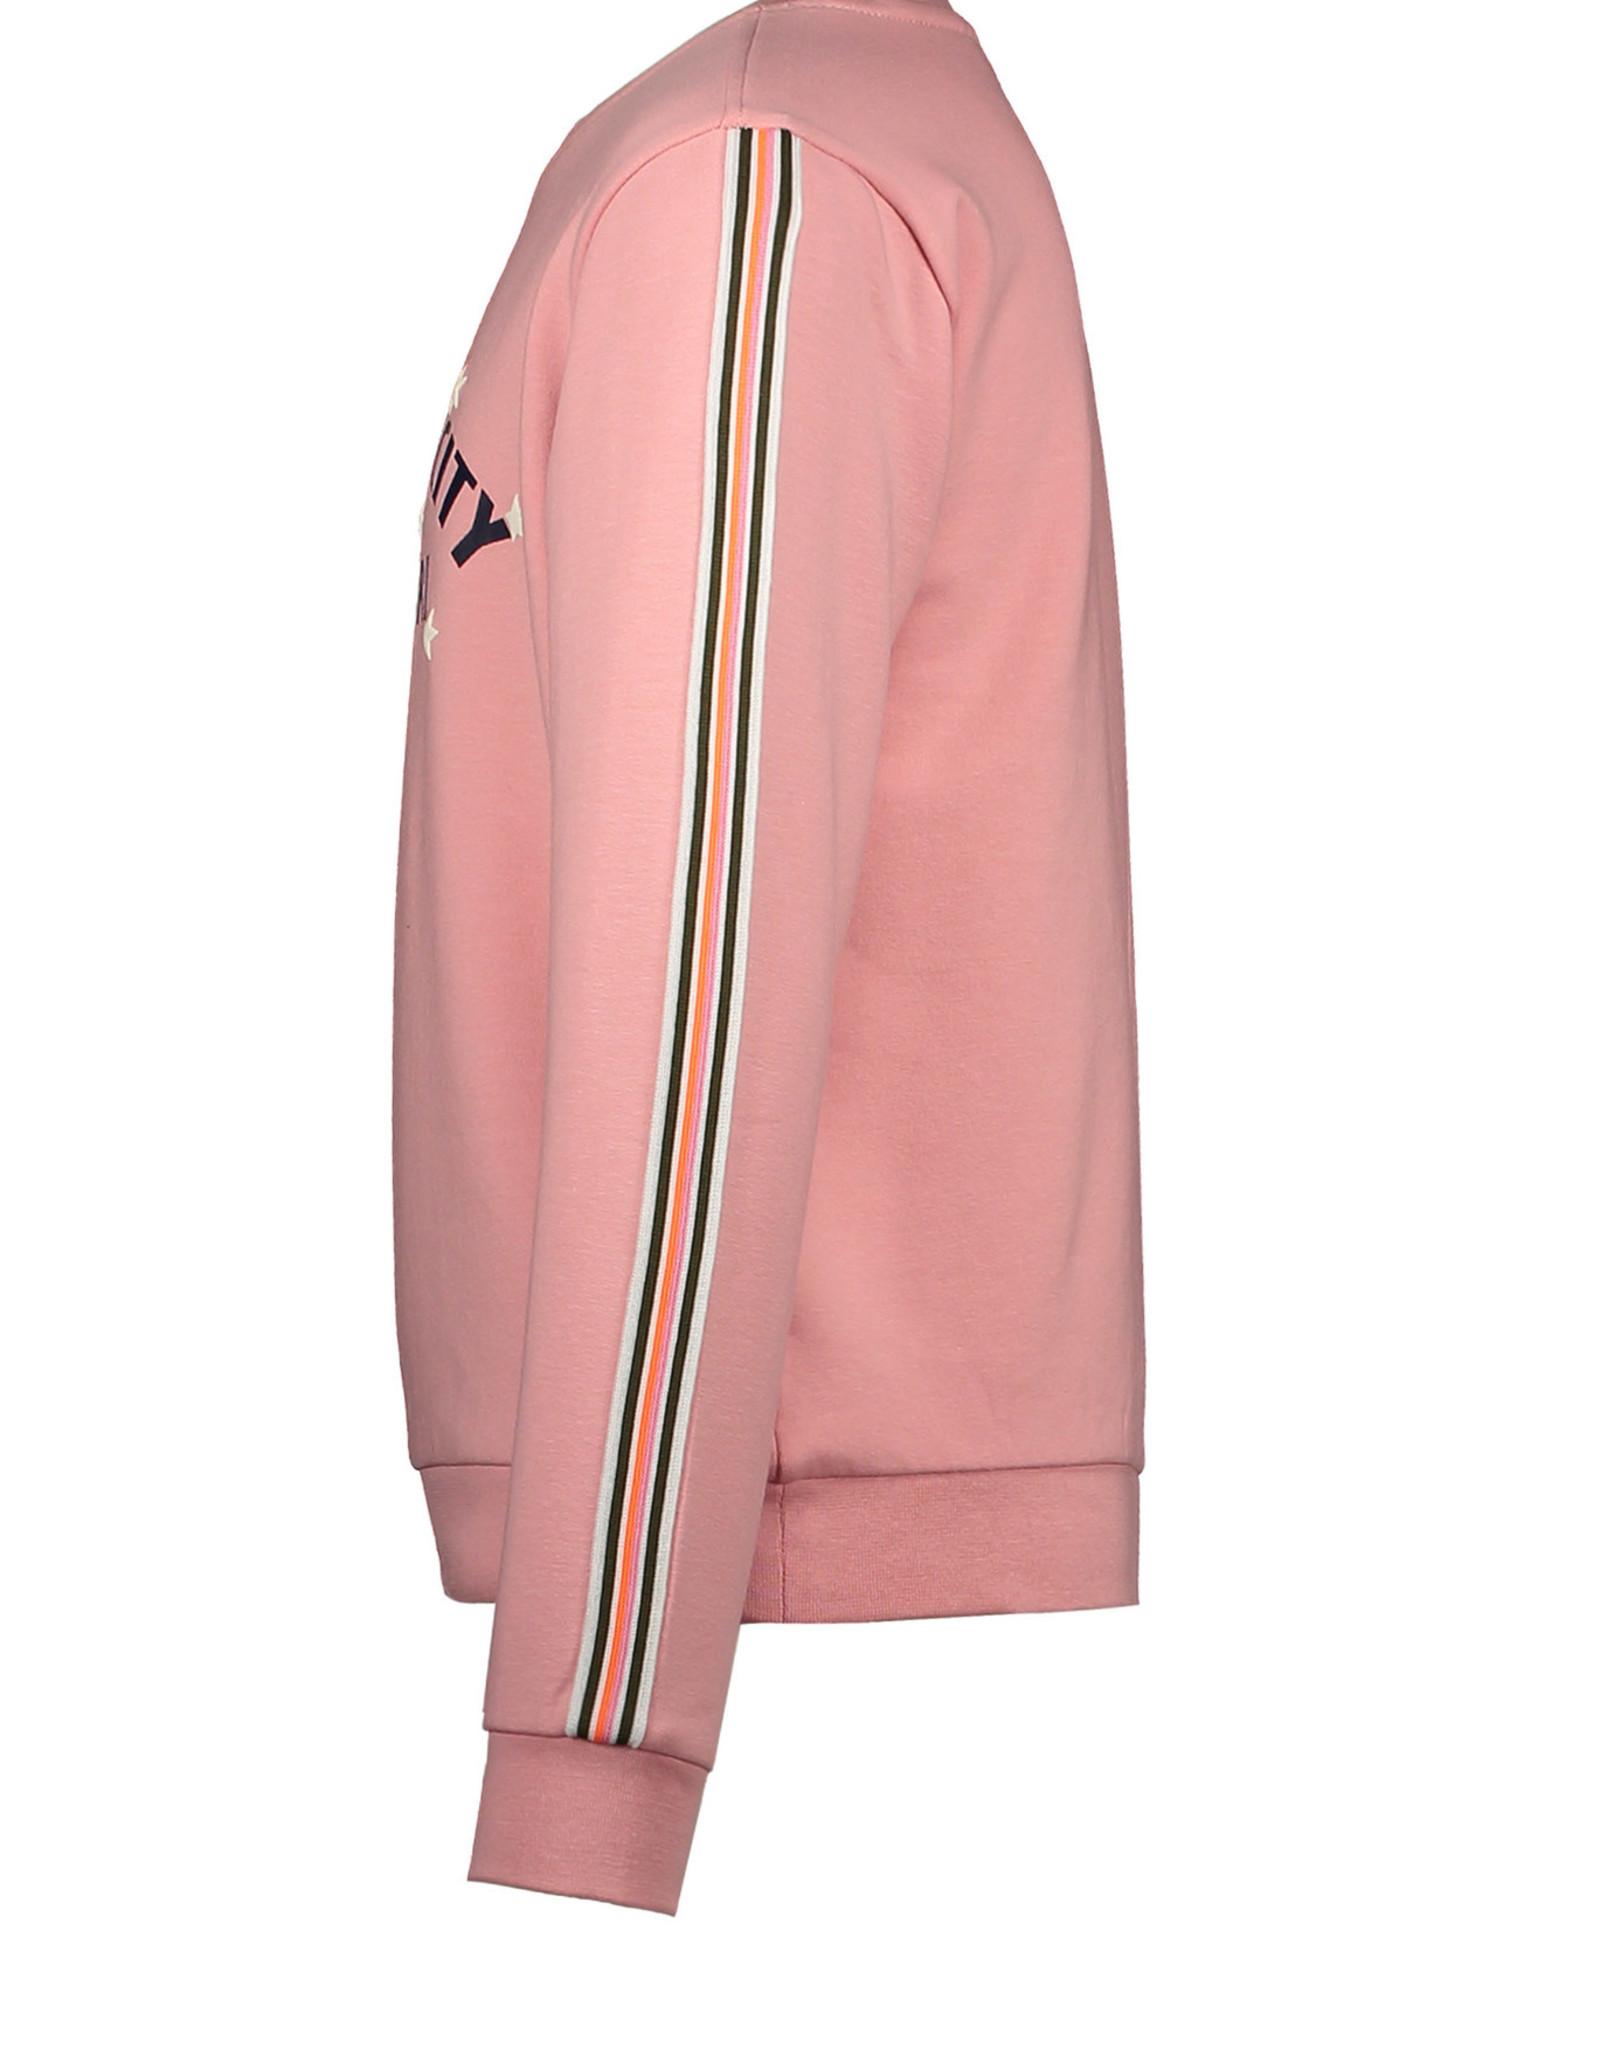 Tygo&Vito Tygo&Vito sweater 5301 soft pink